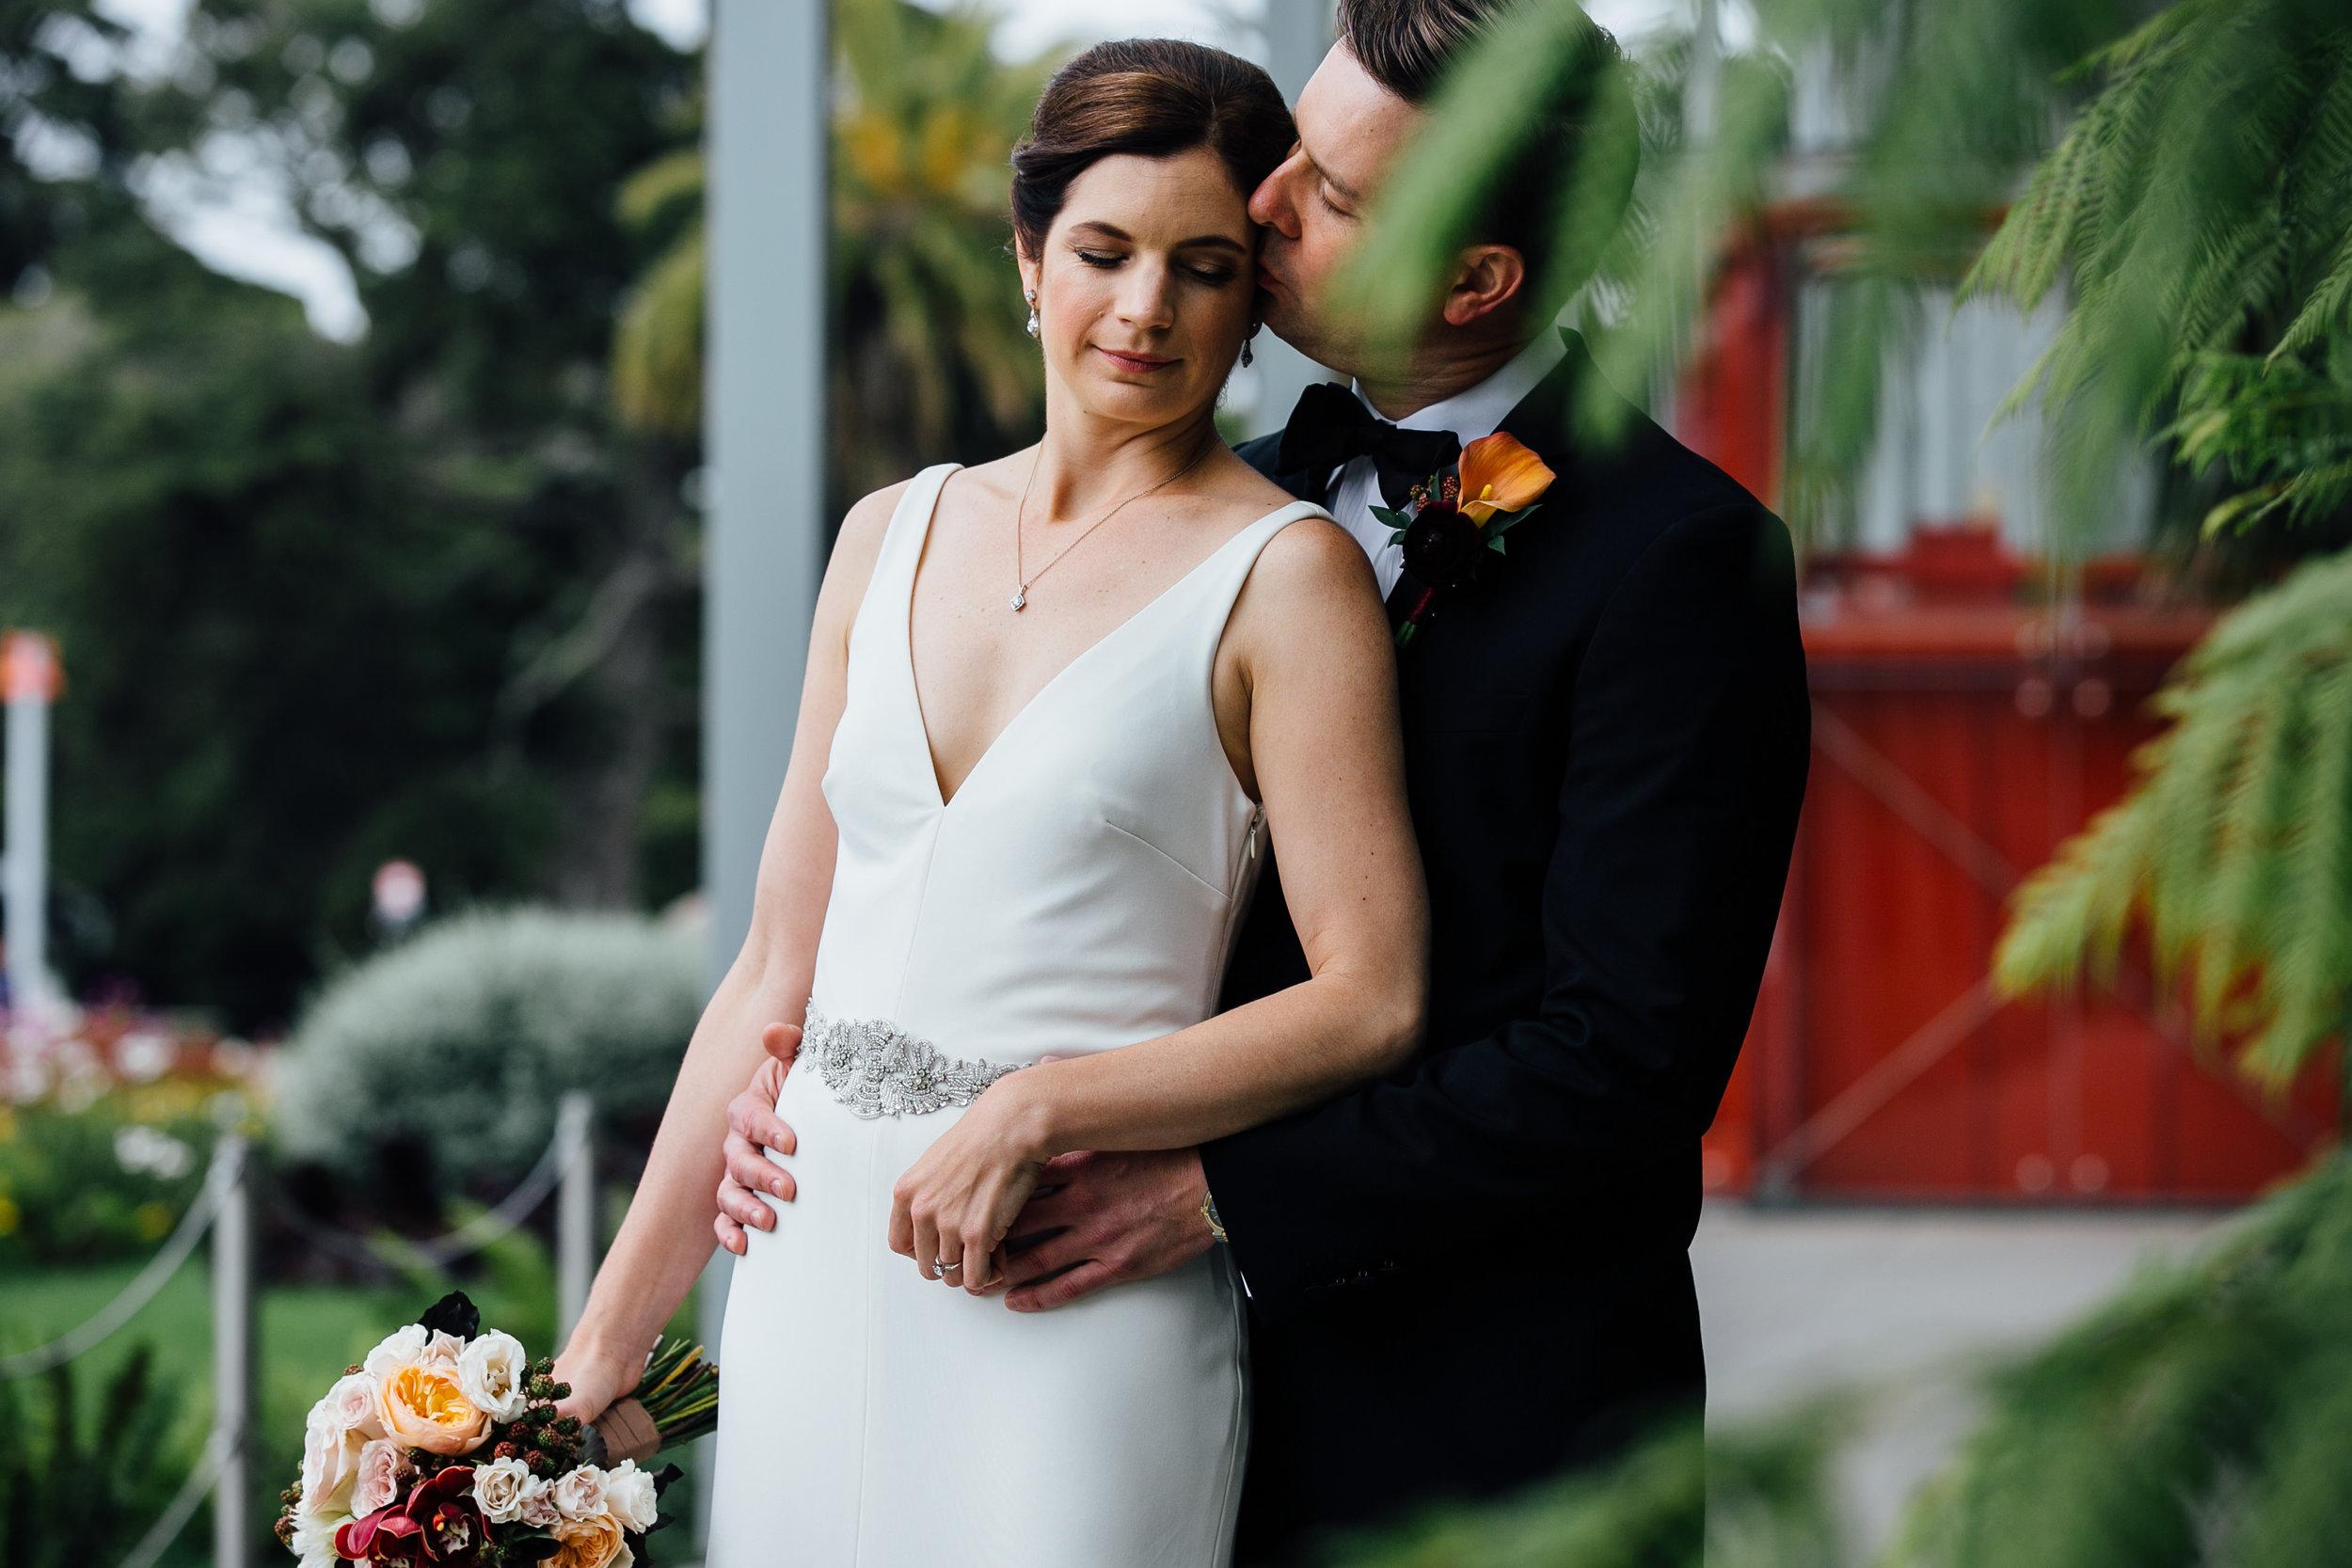 Wedding_KathleenMichael_BG_Portraits-267.jpg